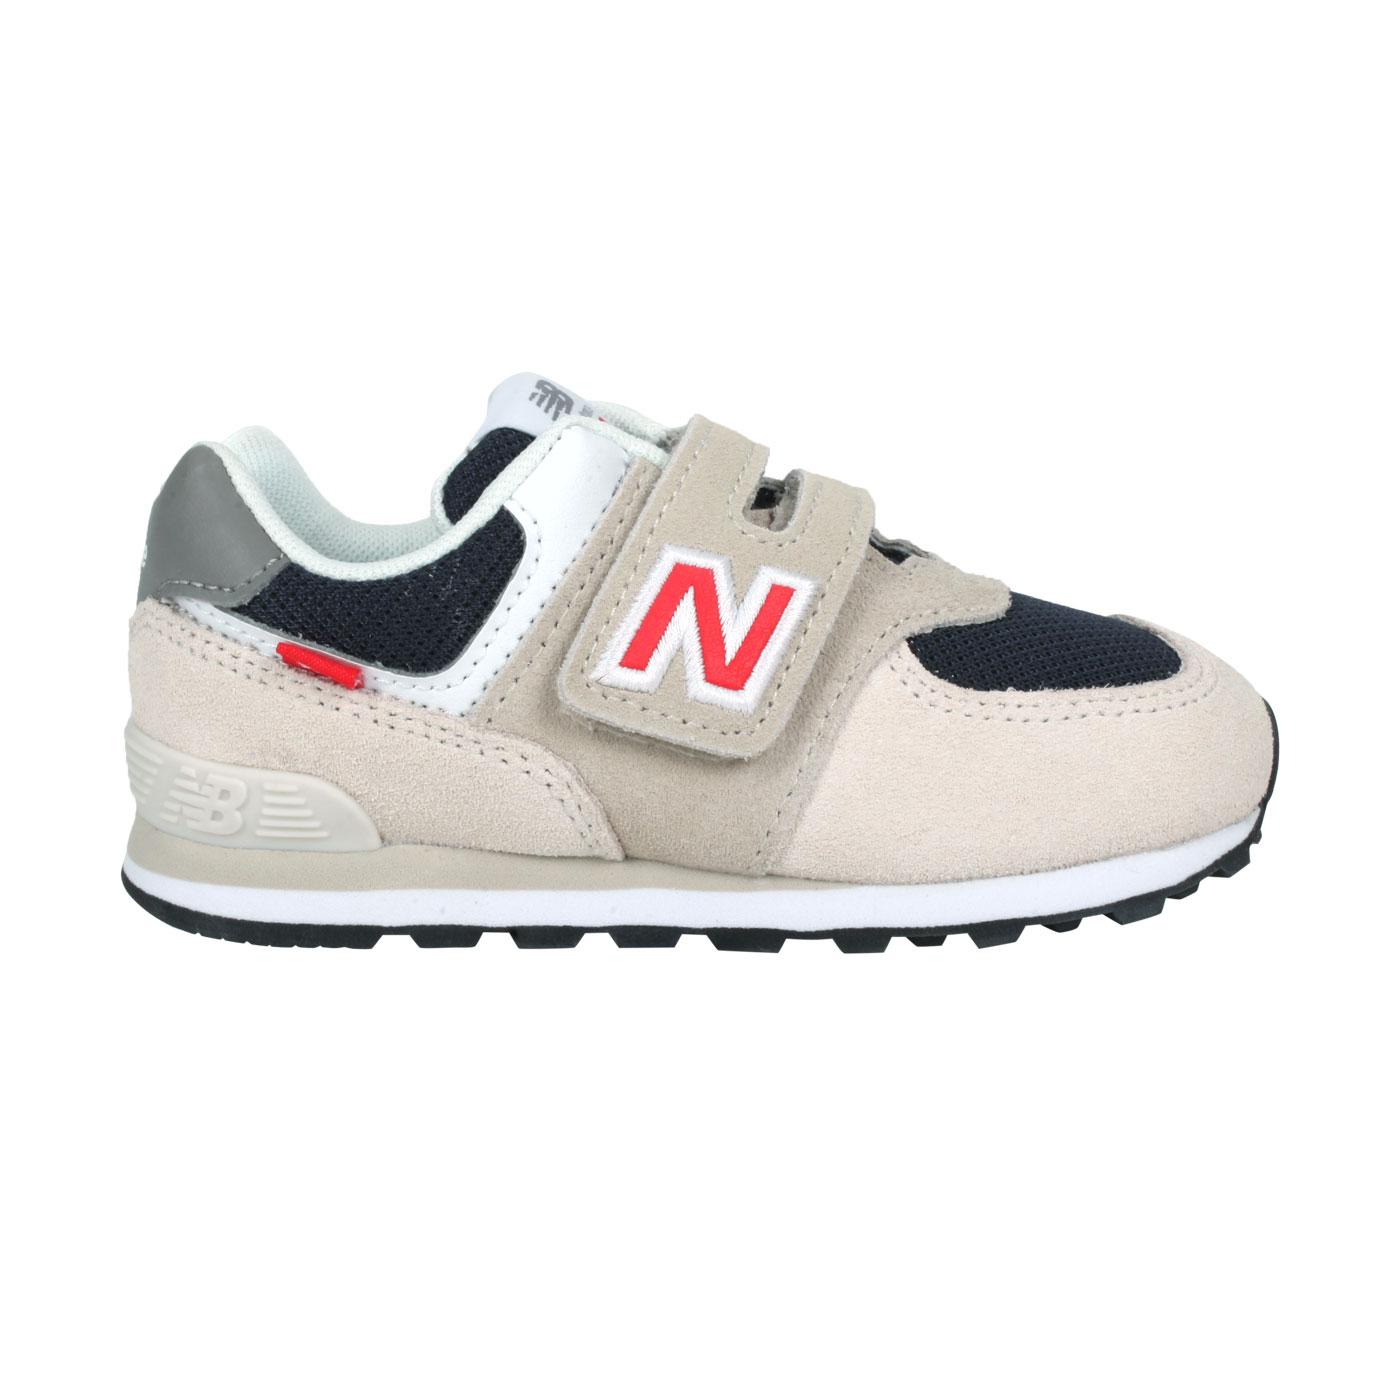 NEW BALANCE 小童休閒運動鞋-WIDE IV574SJ2